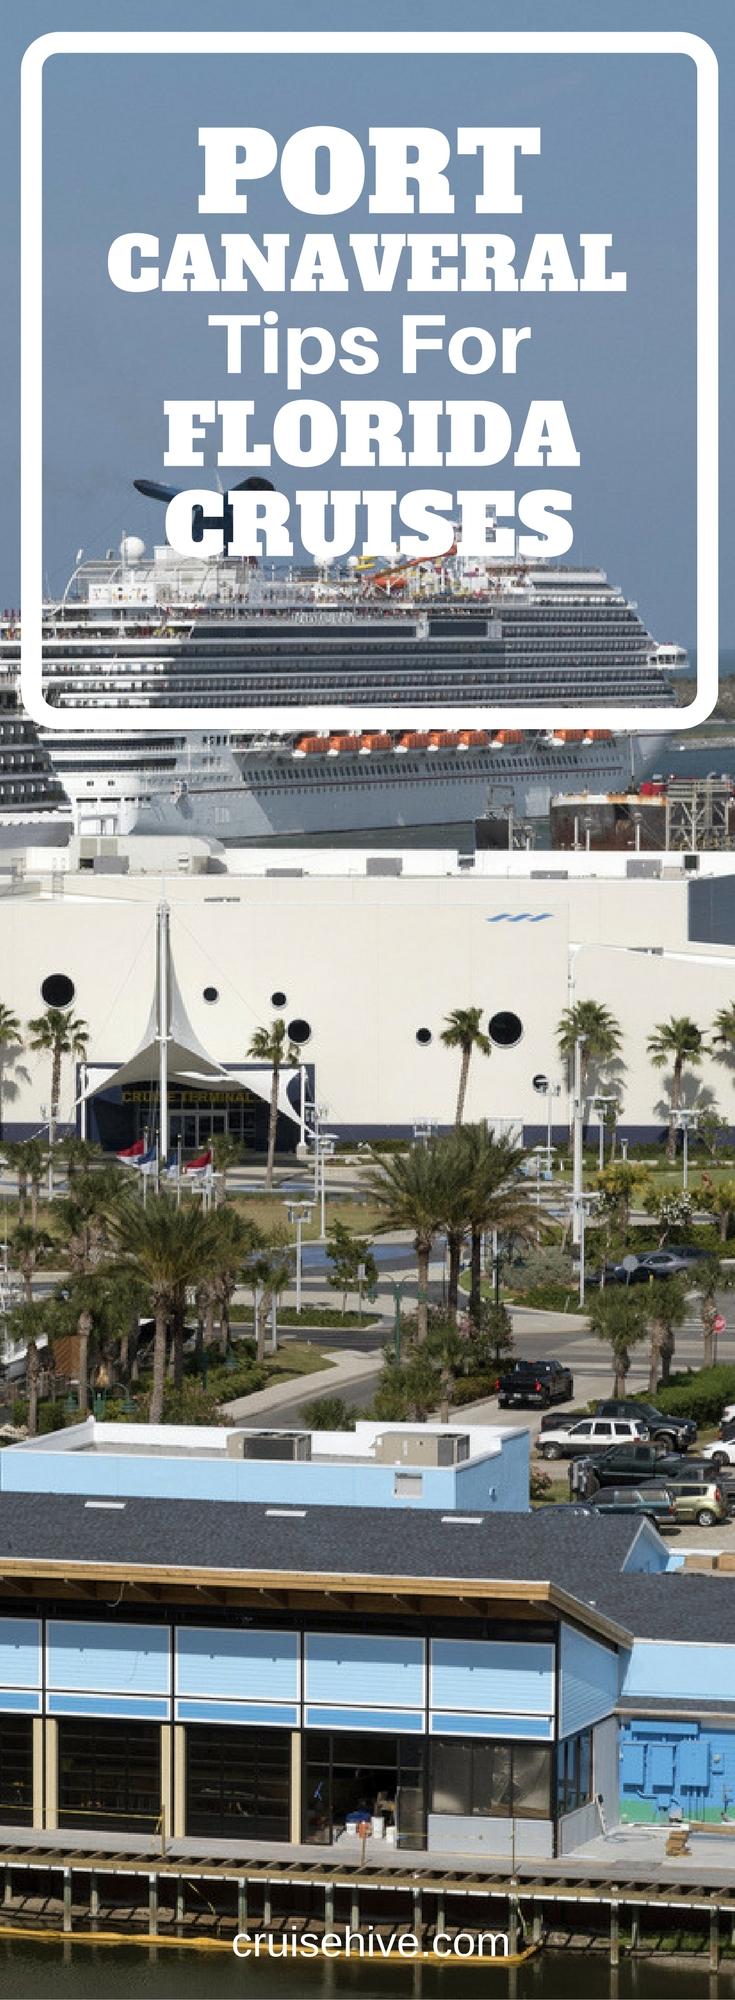 casino cruise in port canaveral